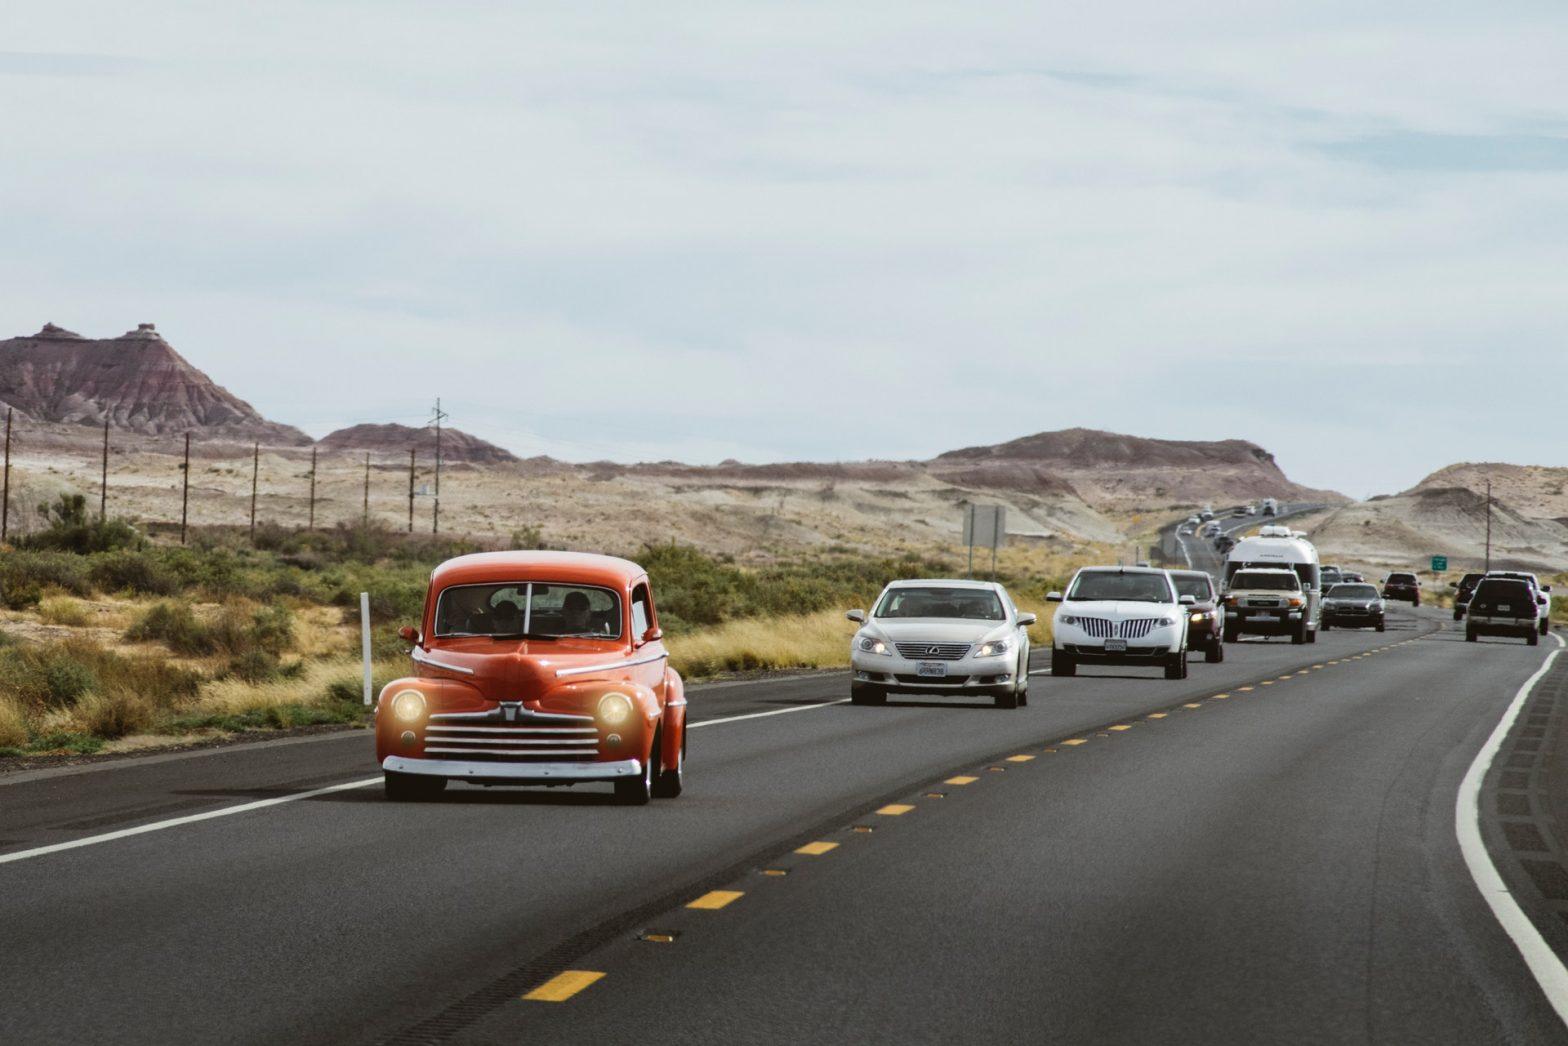 tech companies moving to Arizona 2020